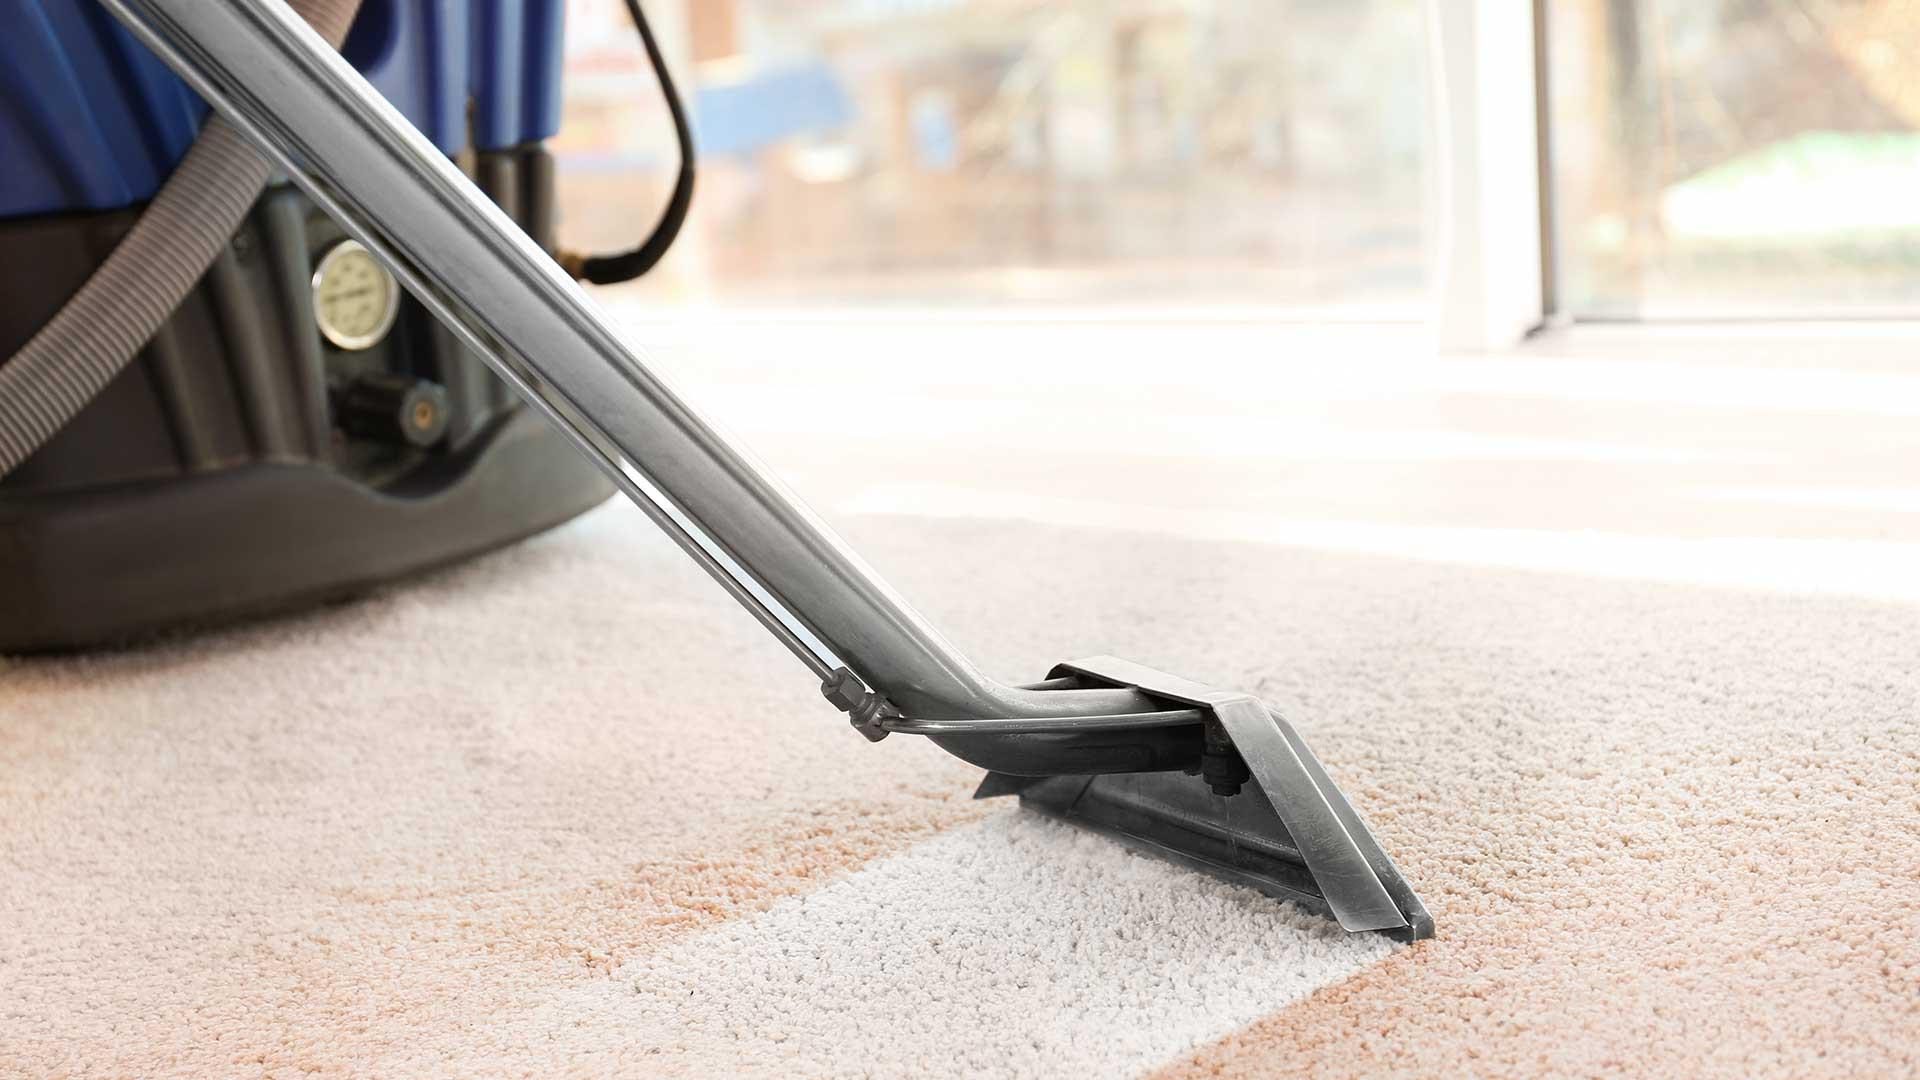 Carpet Cleaning $35 Per Room